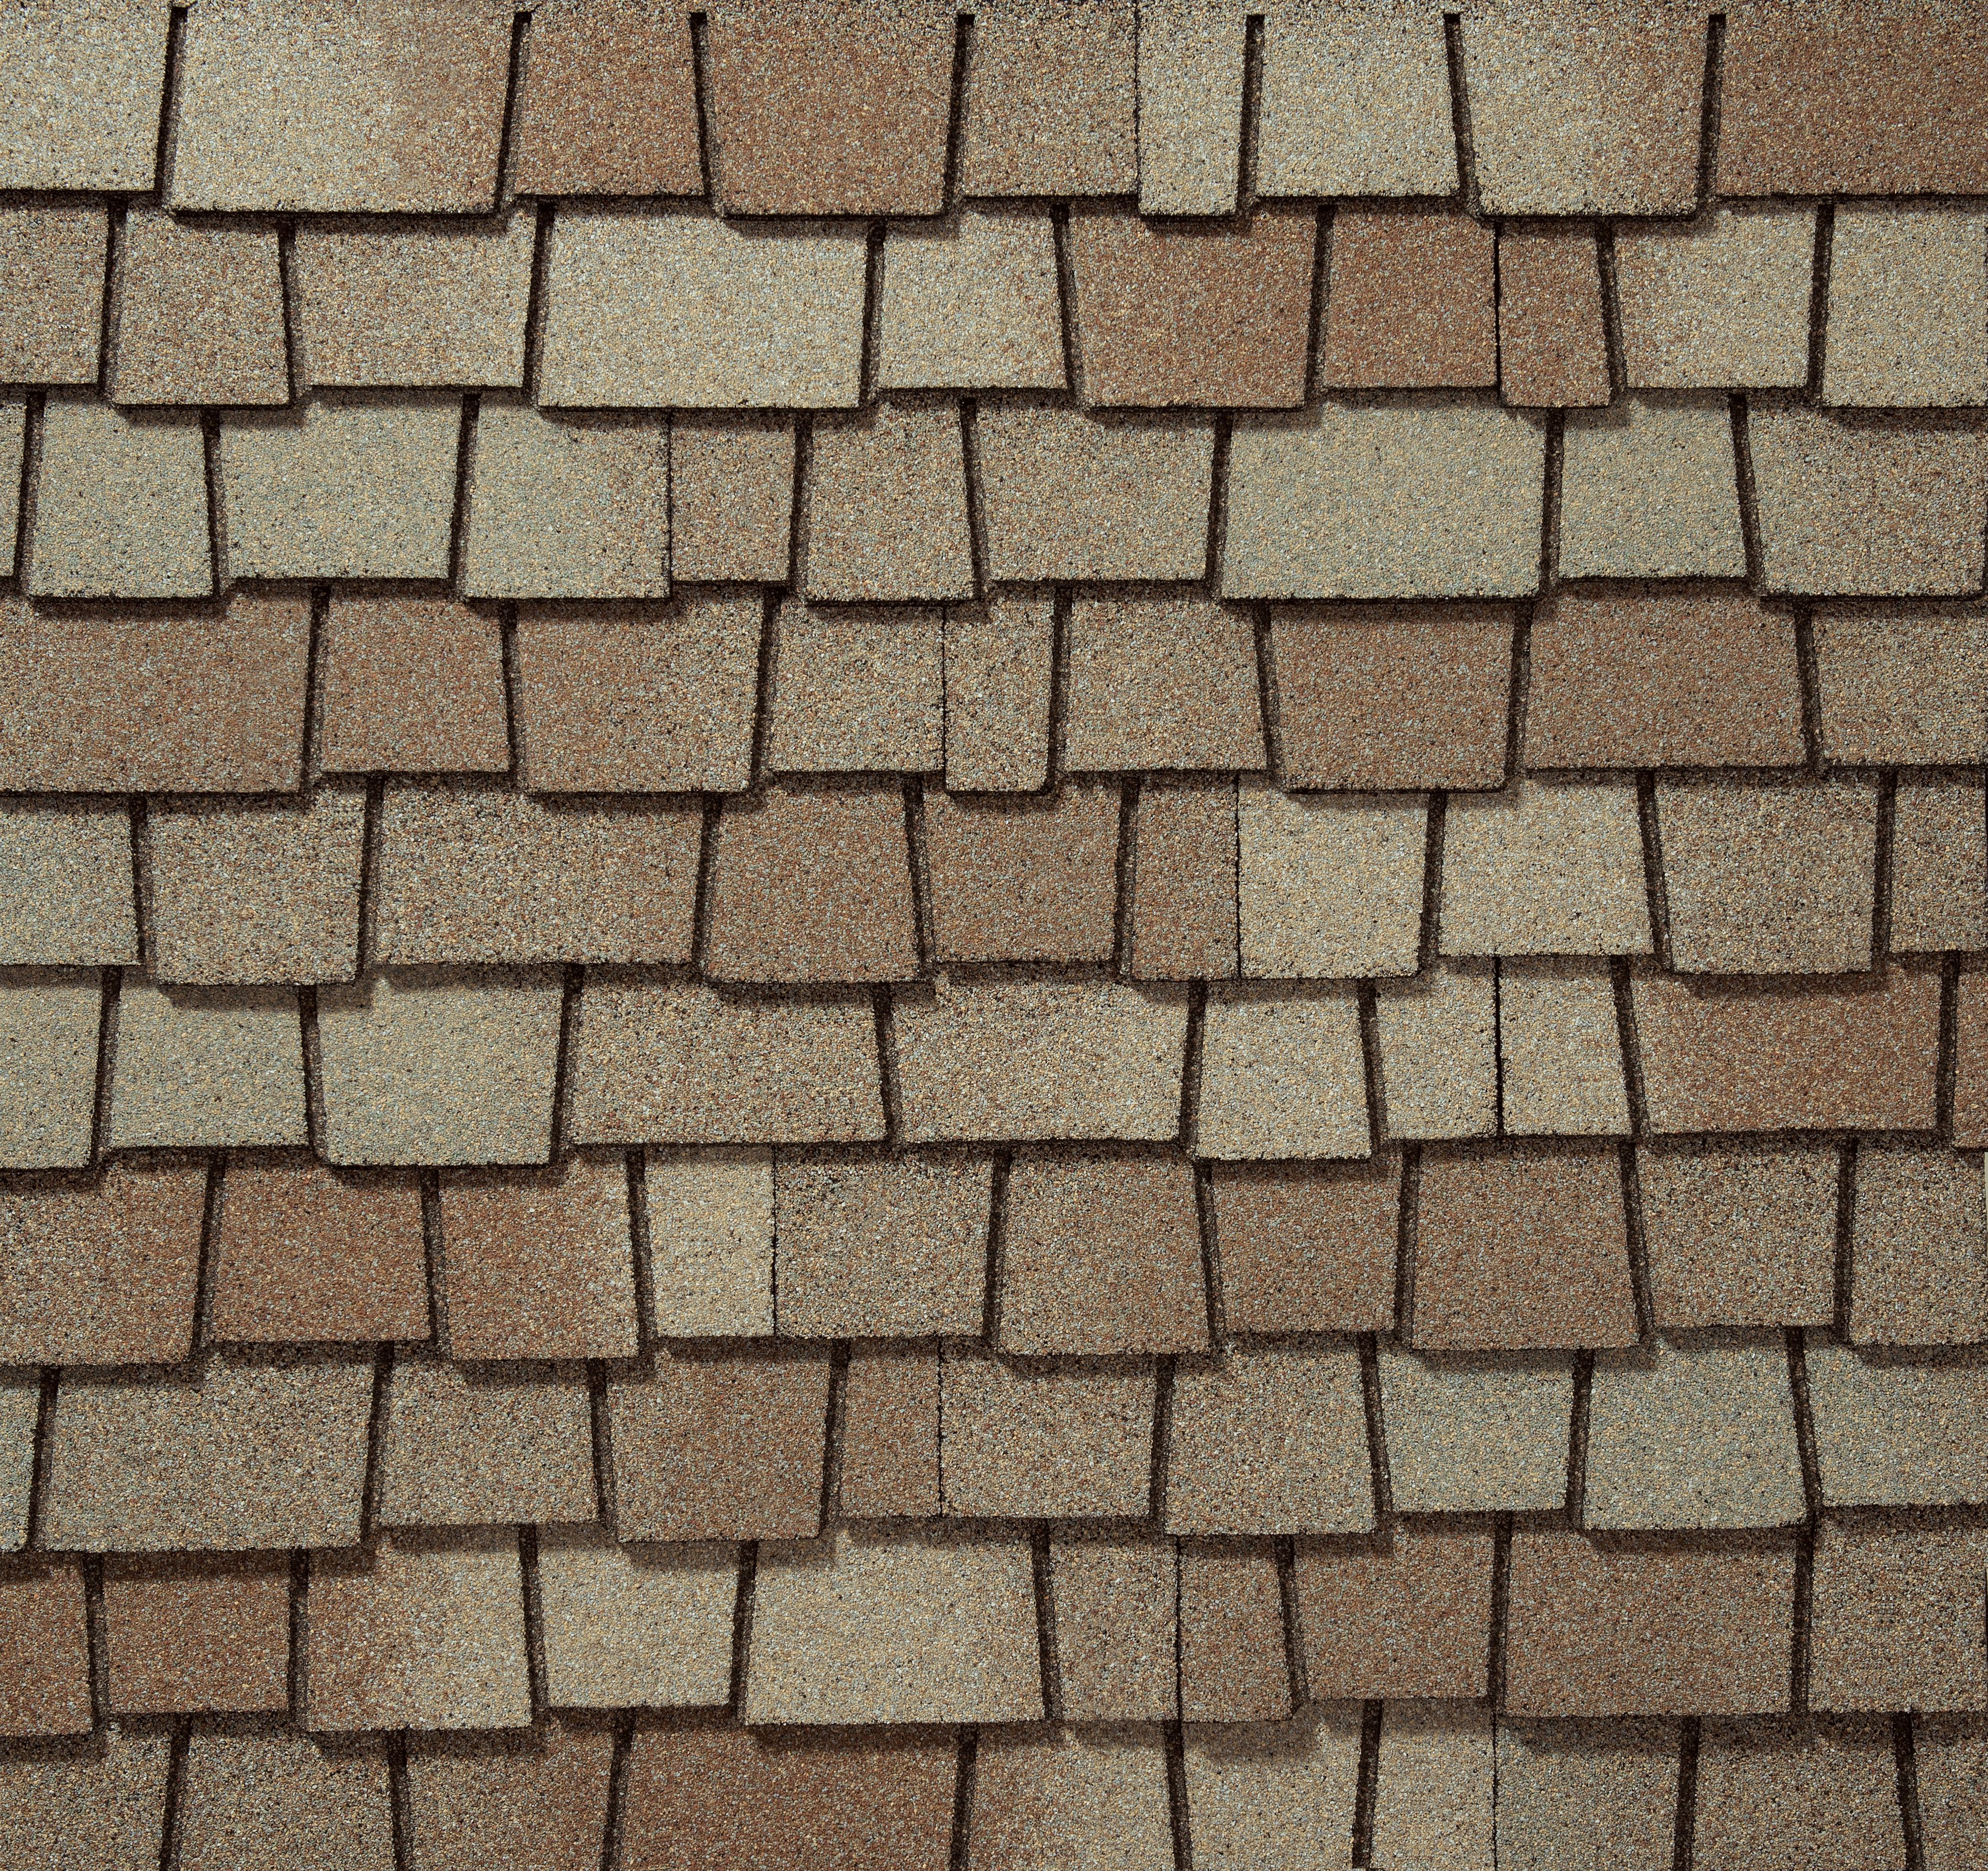 Glenwood Golden Prairie Jpg 4 155 3 911 Pixels Architectural Shingles Shingling Architectural Shingles Roof